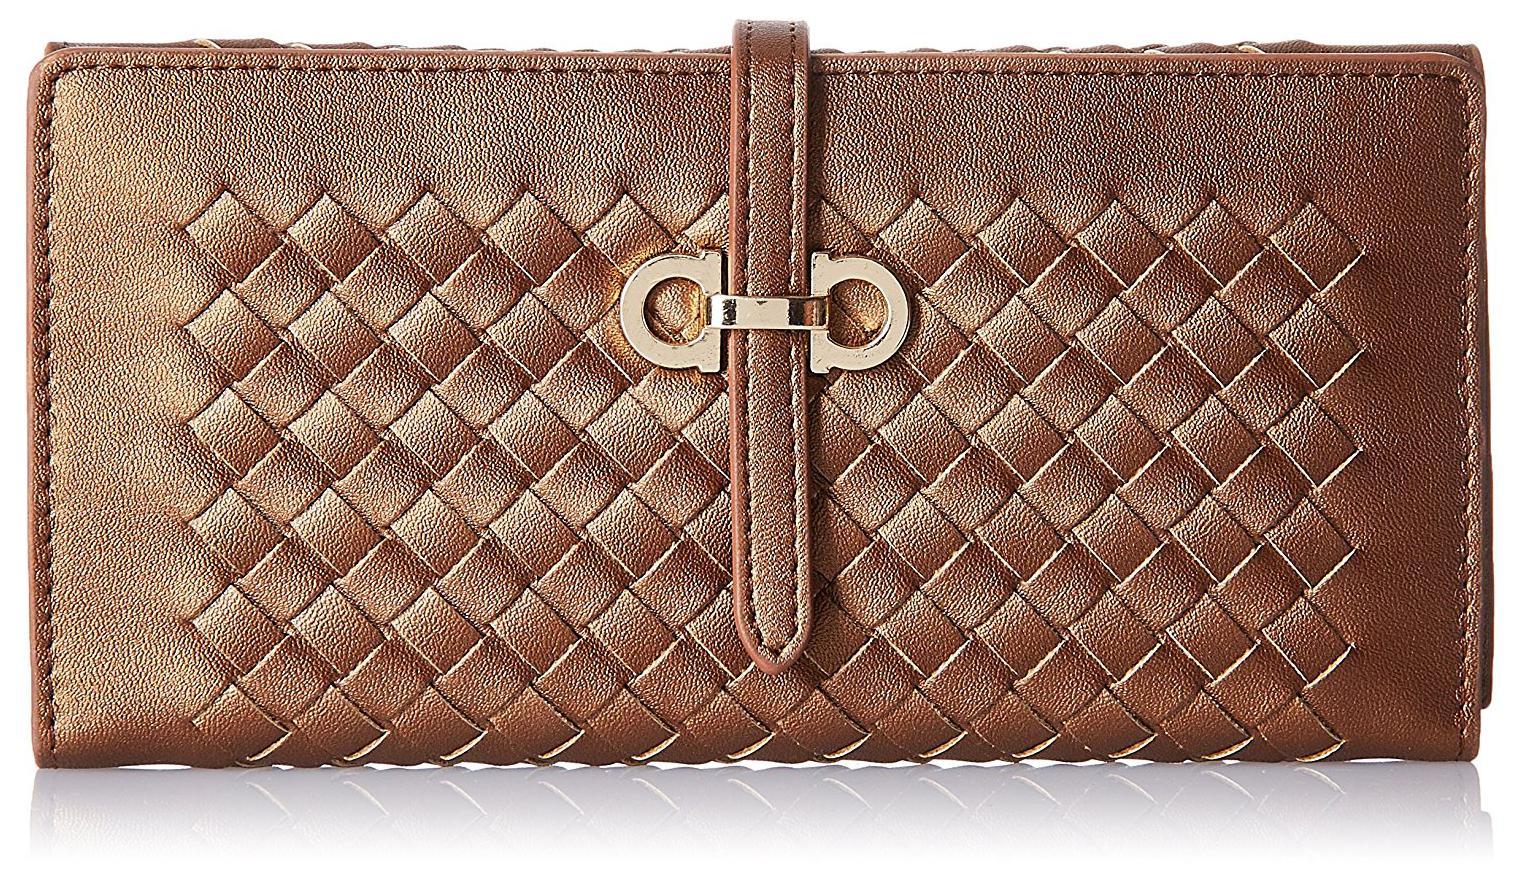 Giordano Women's Wallet (Bronze;2917497031;Wl14Bz)